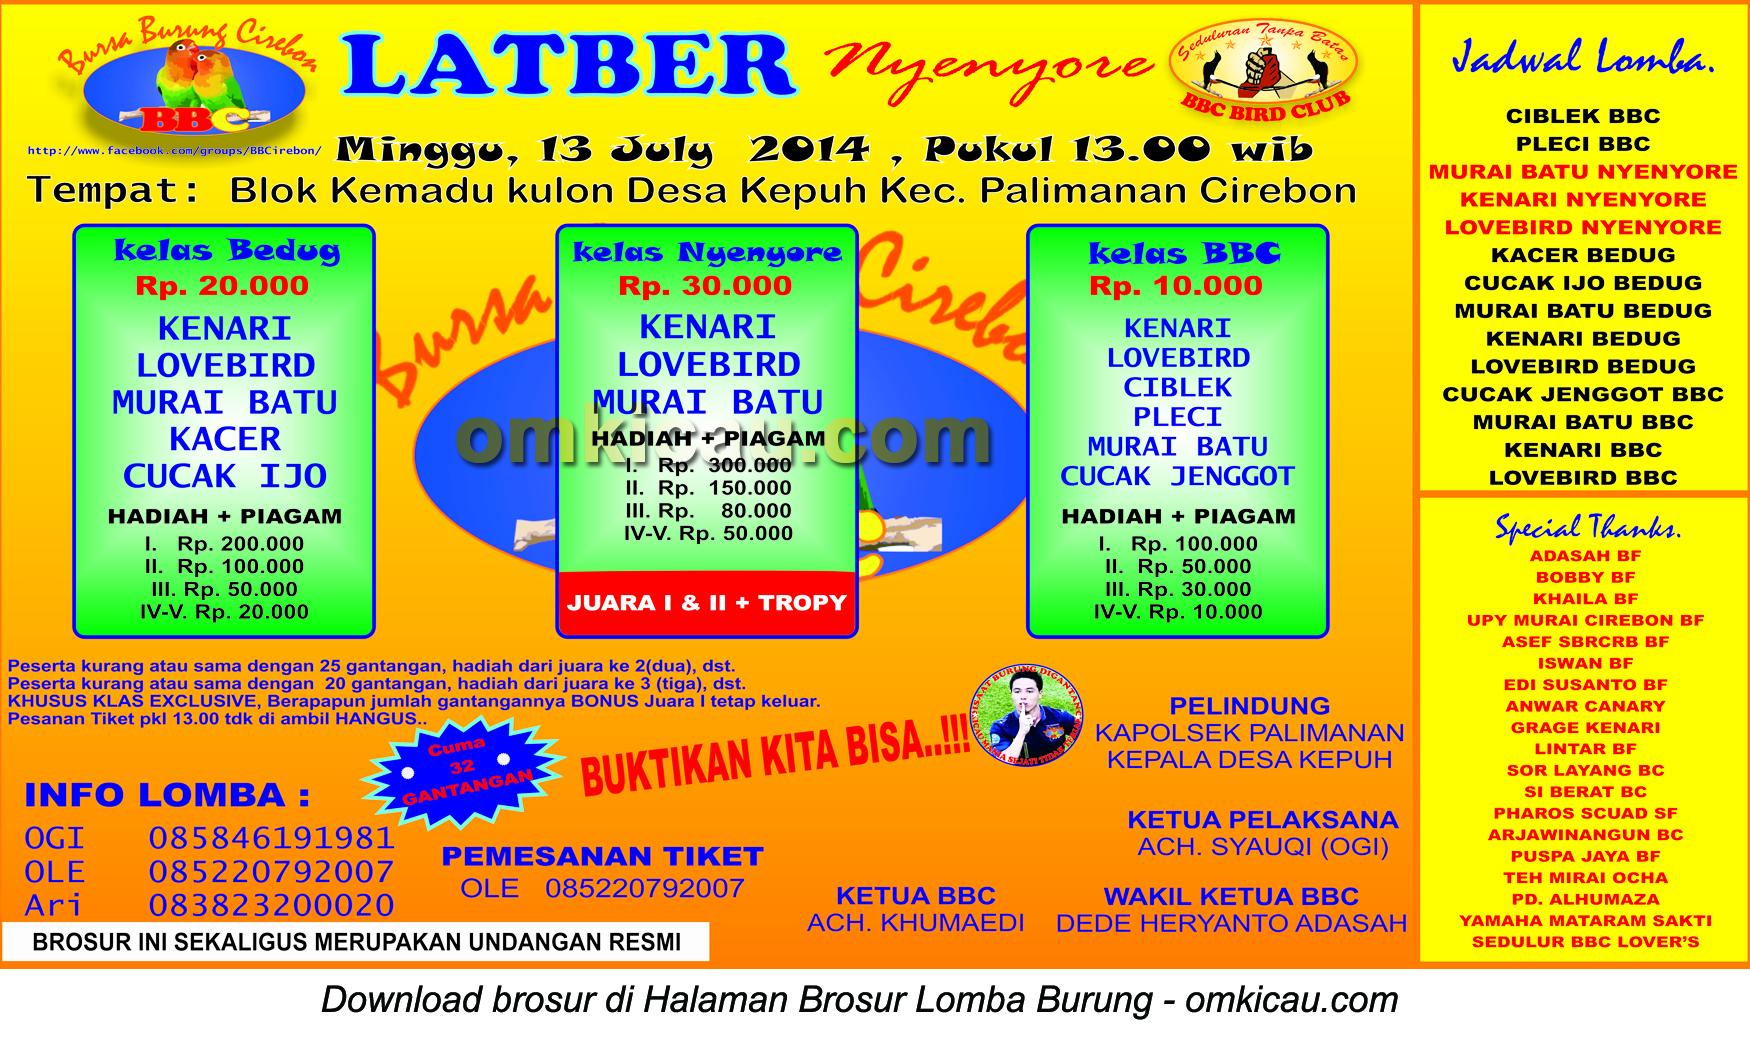 Brosur Latber Nyenyore BBC, Cirebon, 13 Juli 2014